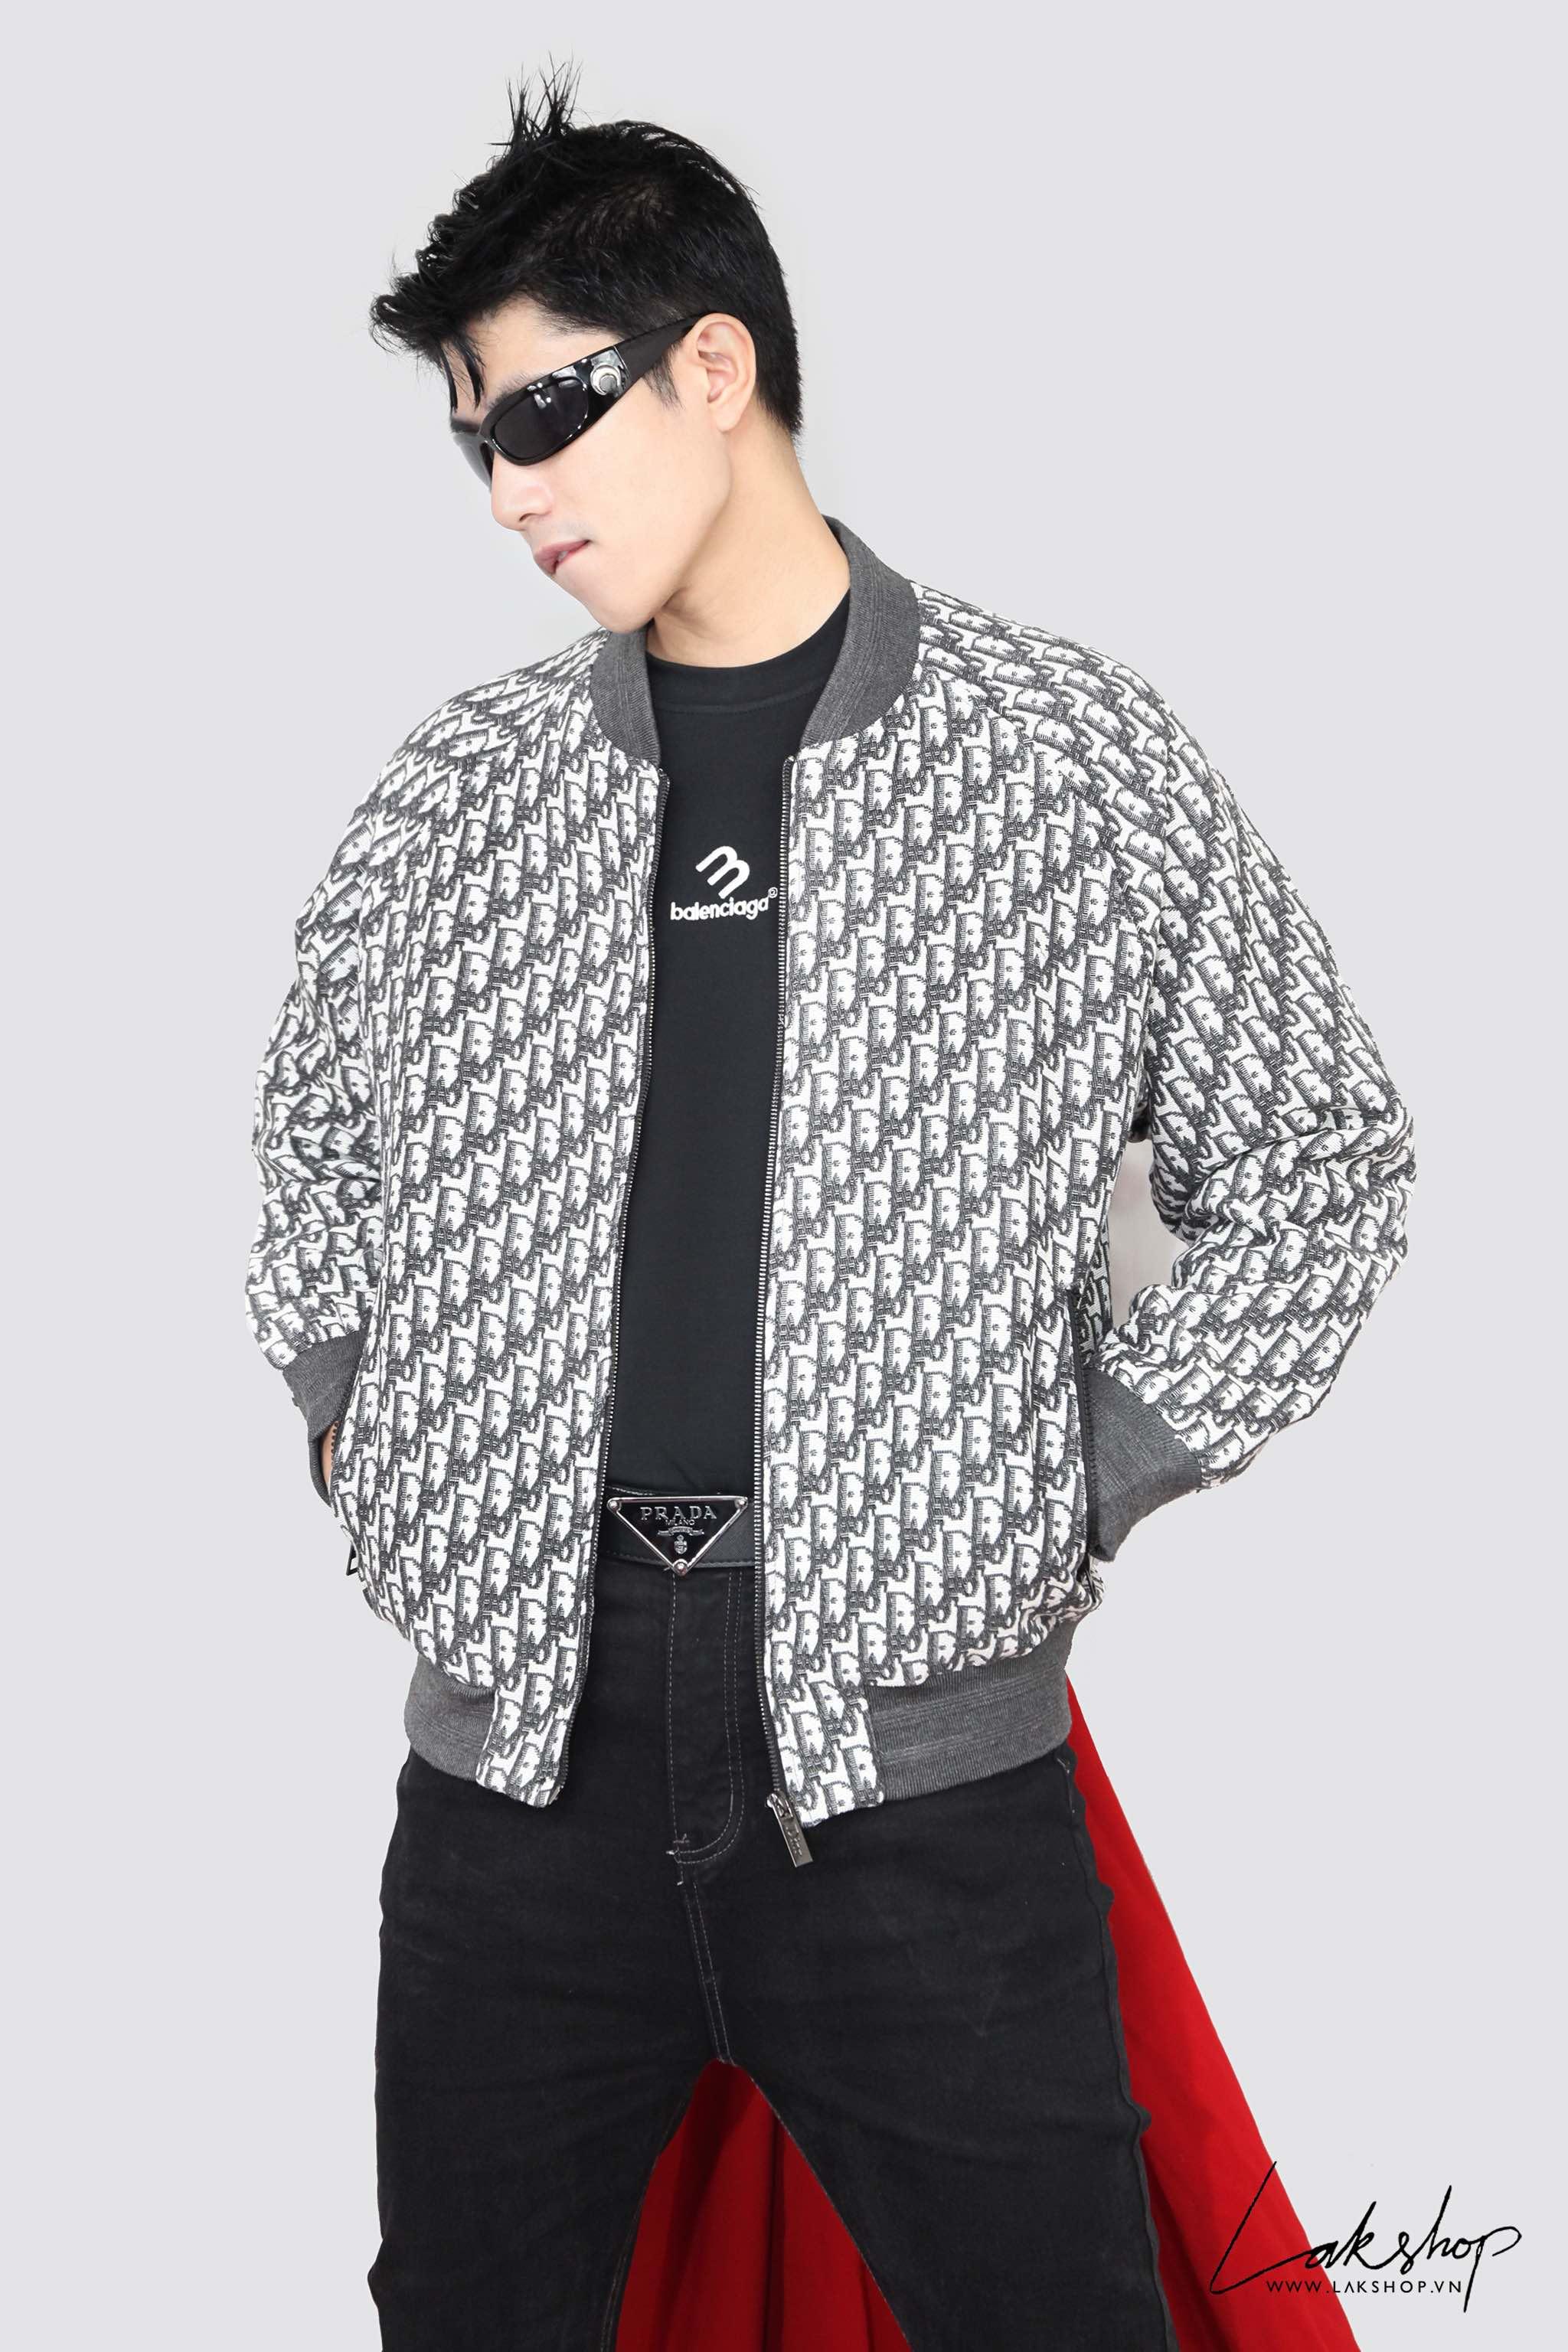 Lak Studios Zebra Black Zed Short Sleeve Shirt cv1